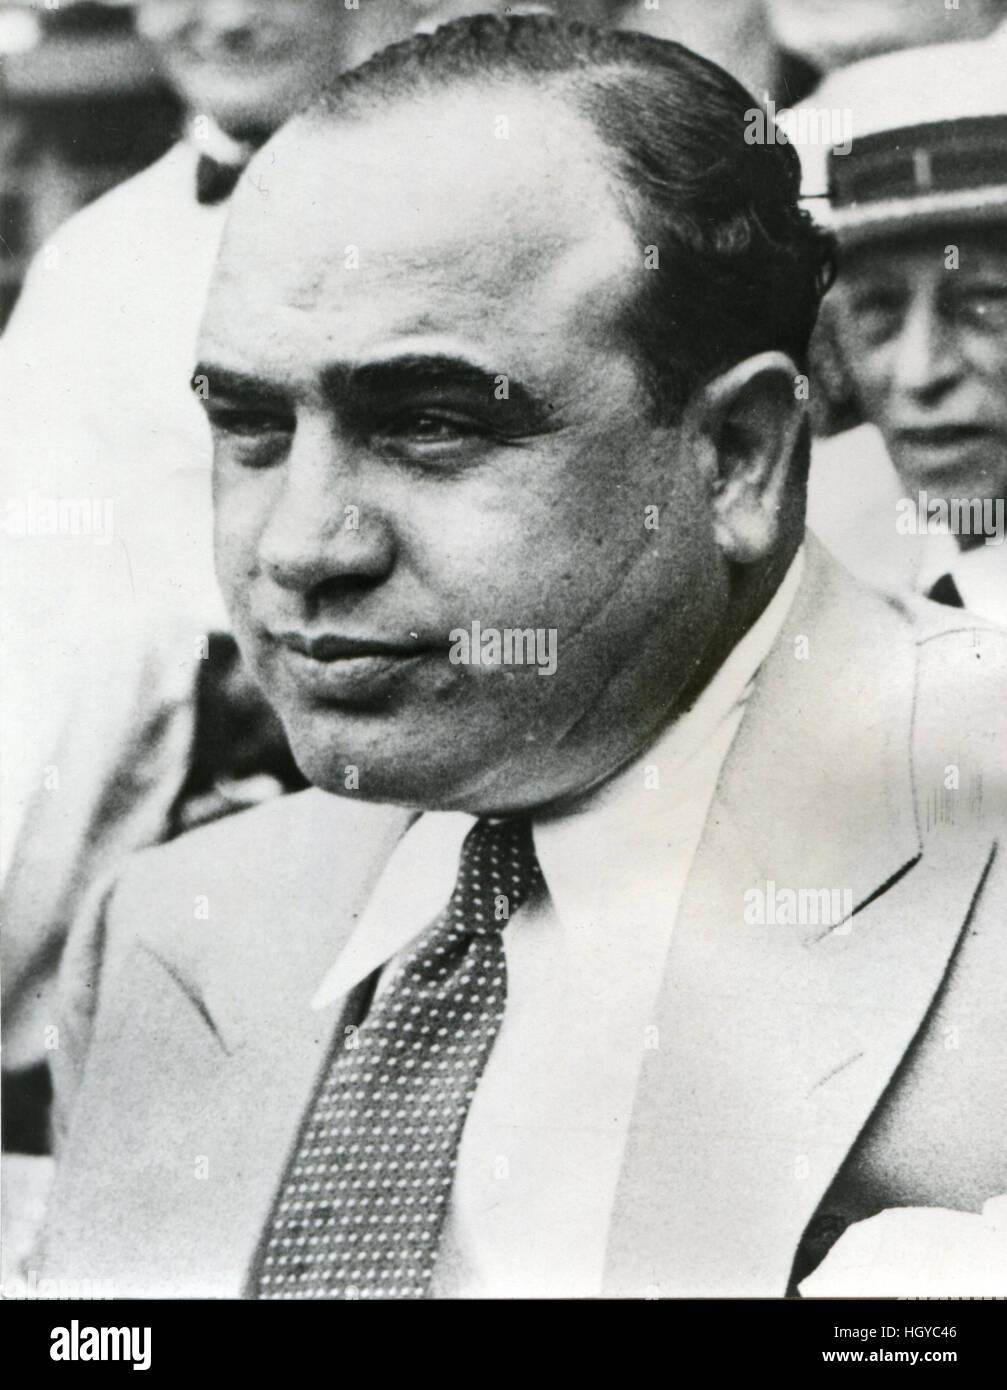 Alphonse G. 'Al' Capone - Stock Image